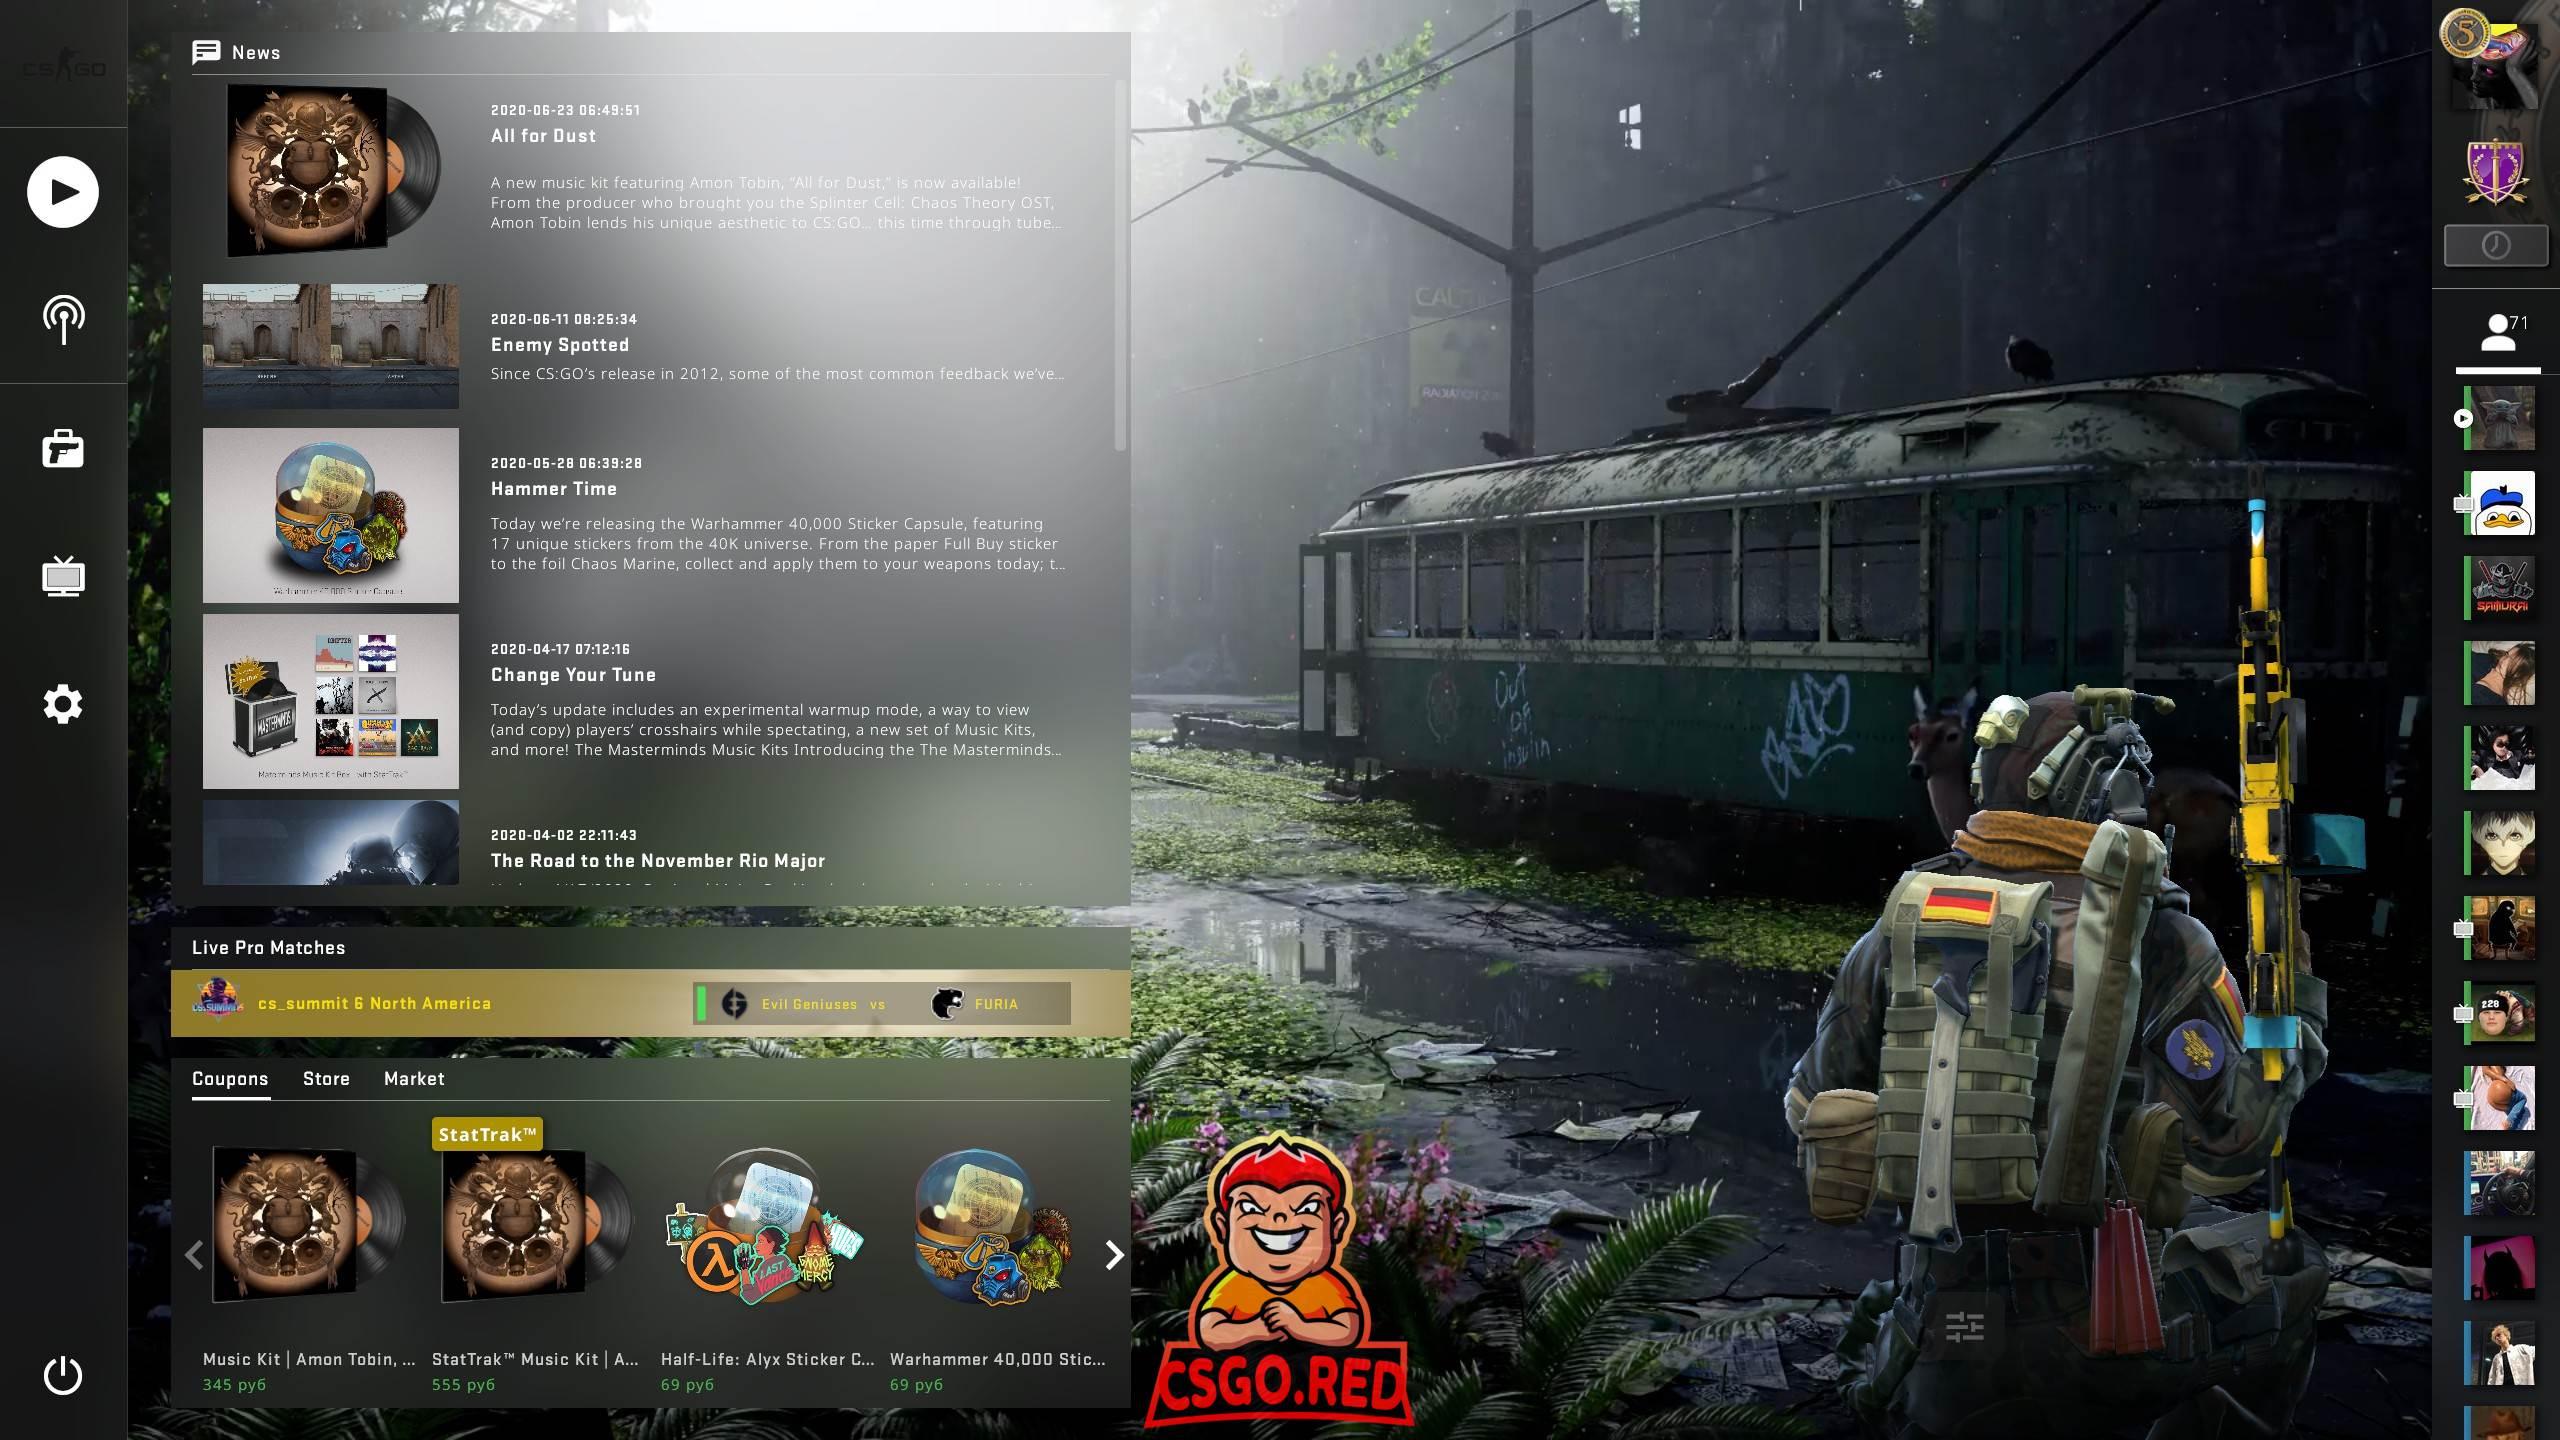 Post Apocalyptic Animated Panorama UI Background